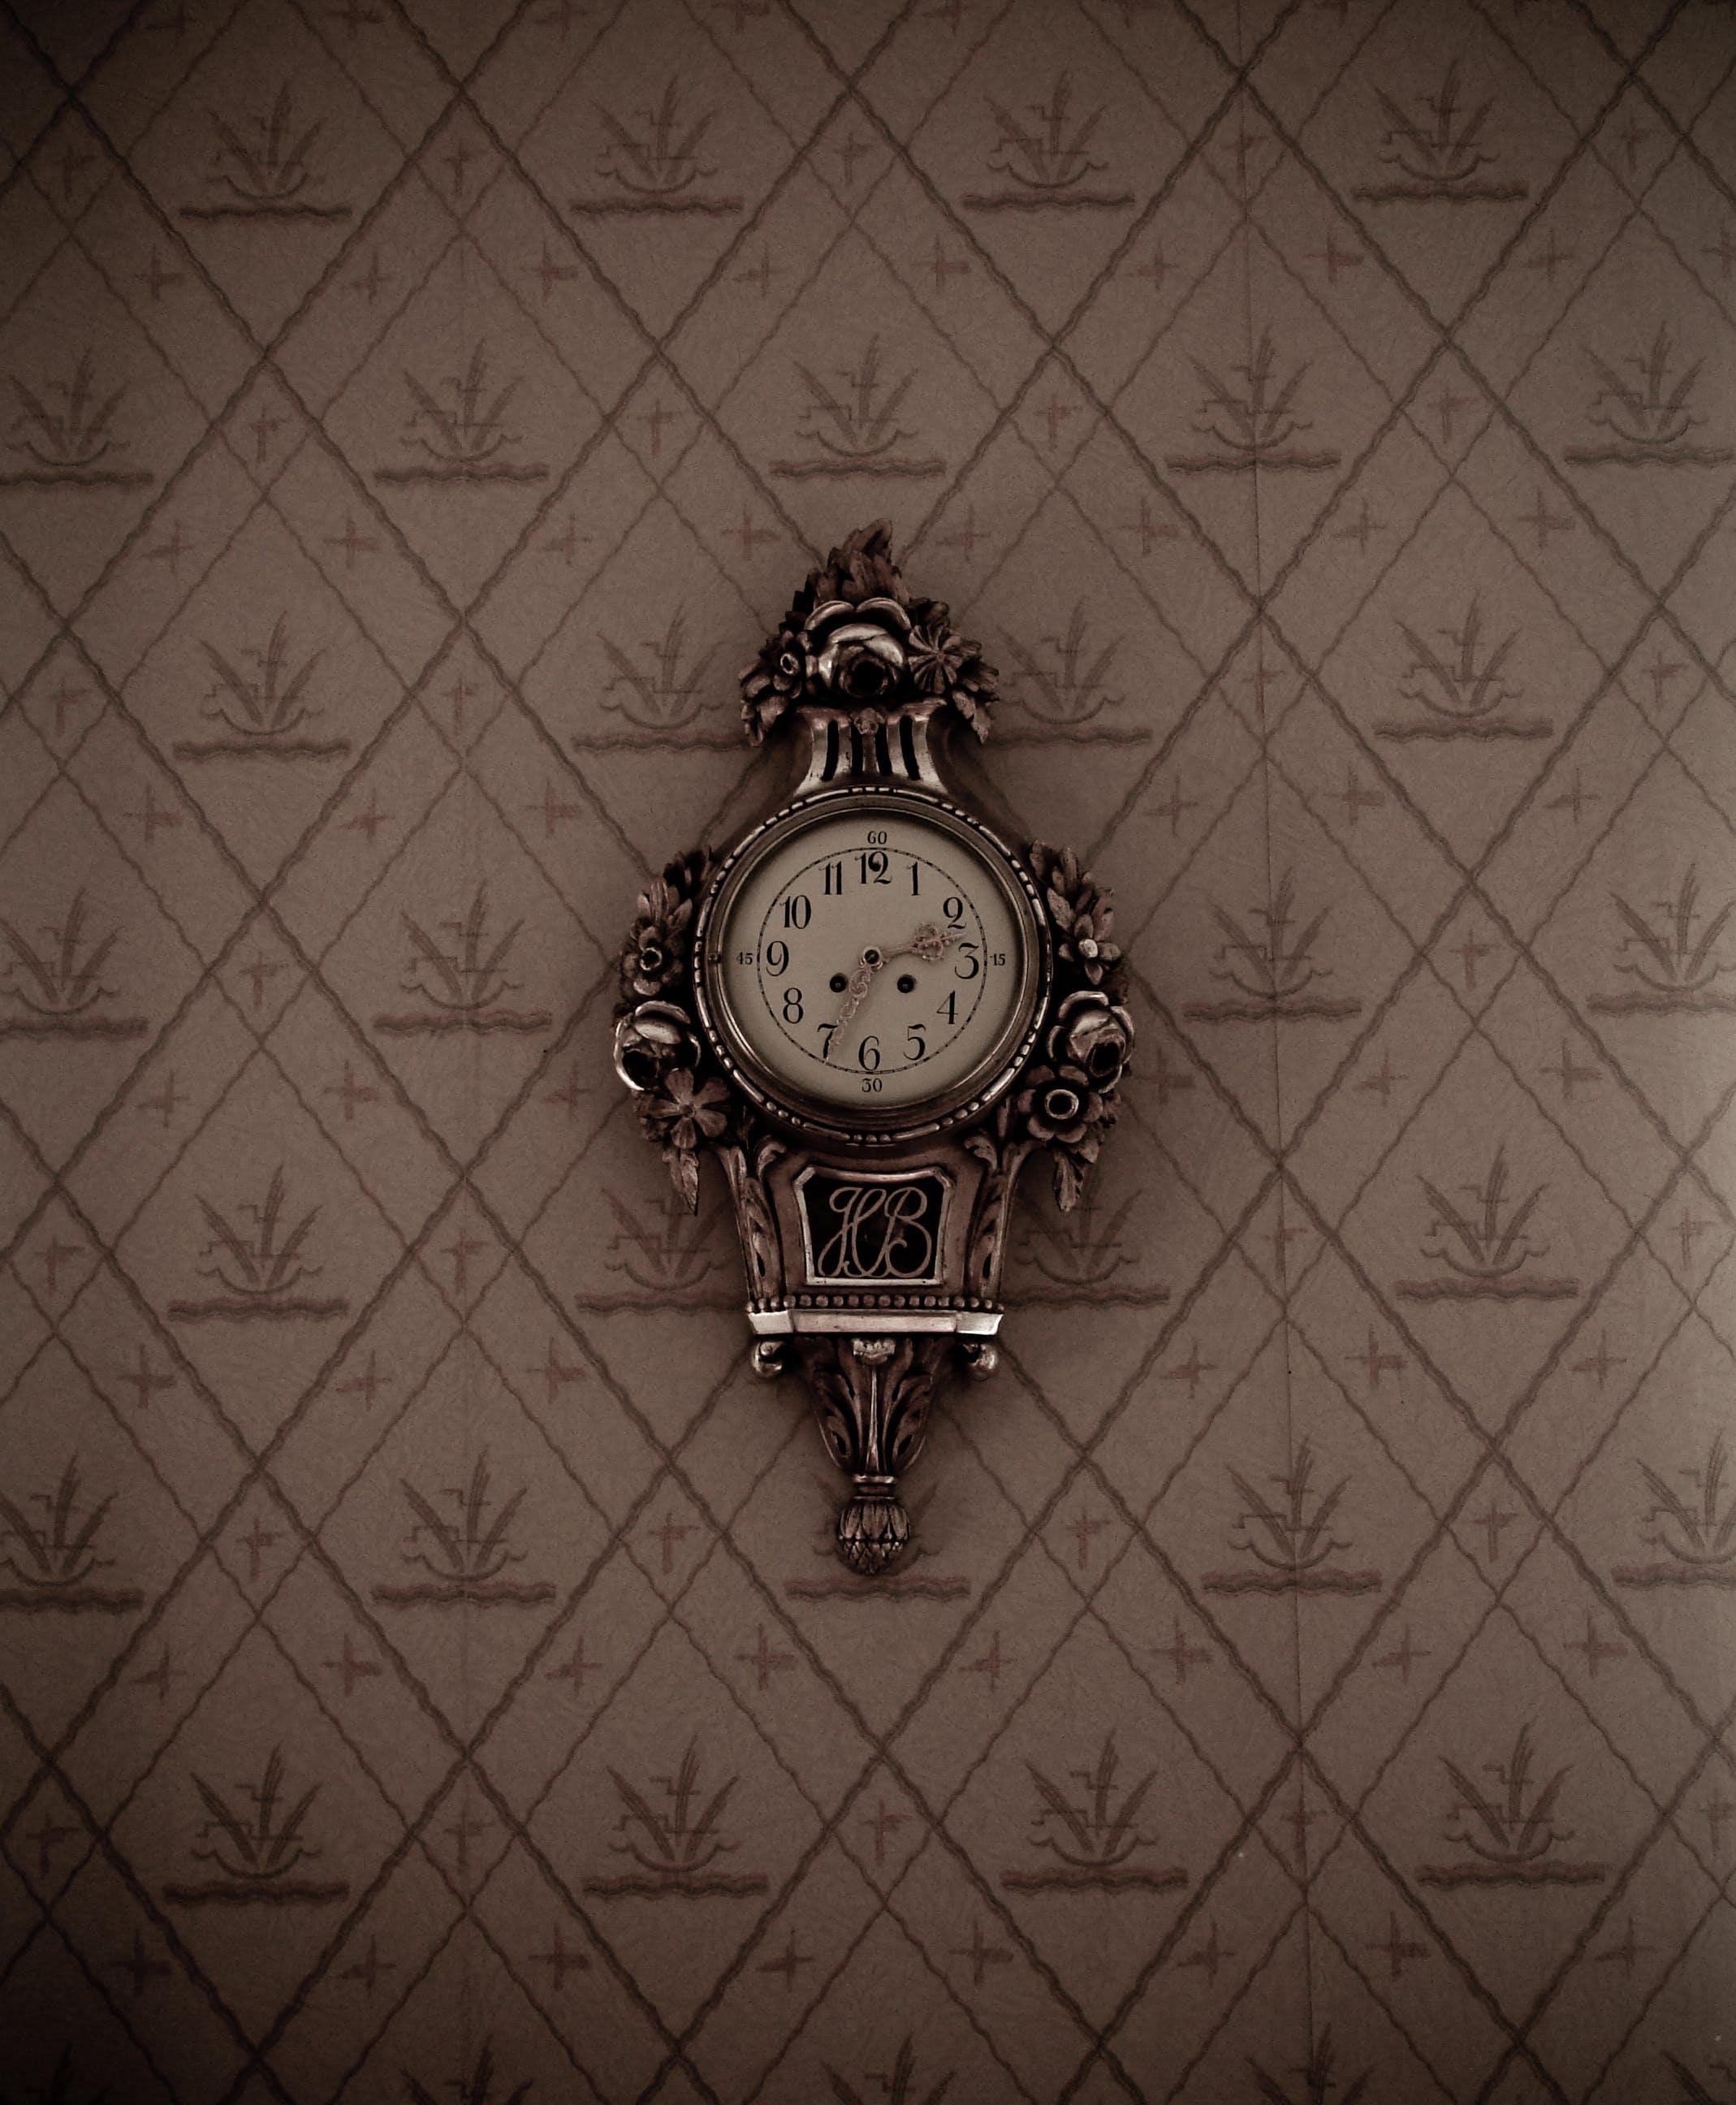 Kostenloses Stock Foto zu analogon, antik, dekoration, design